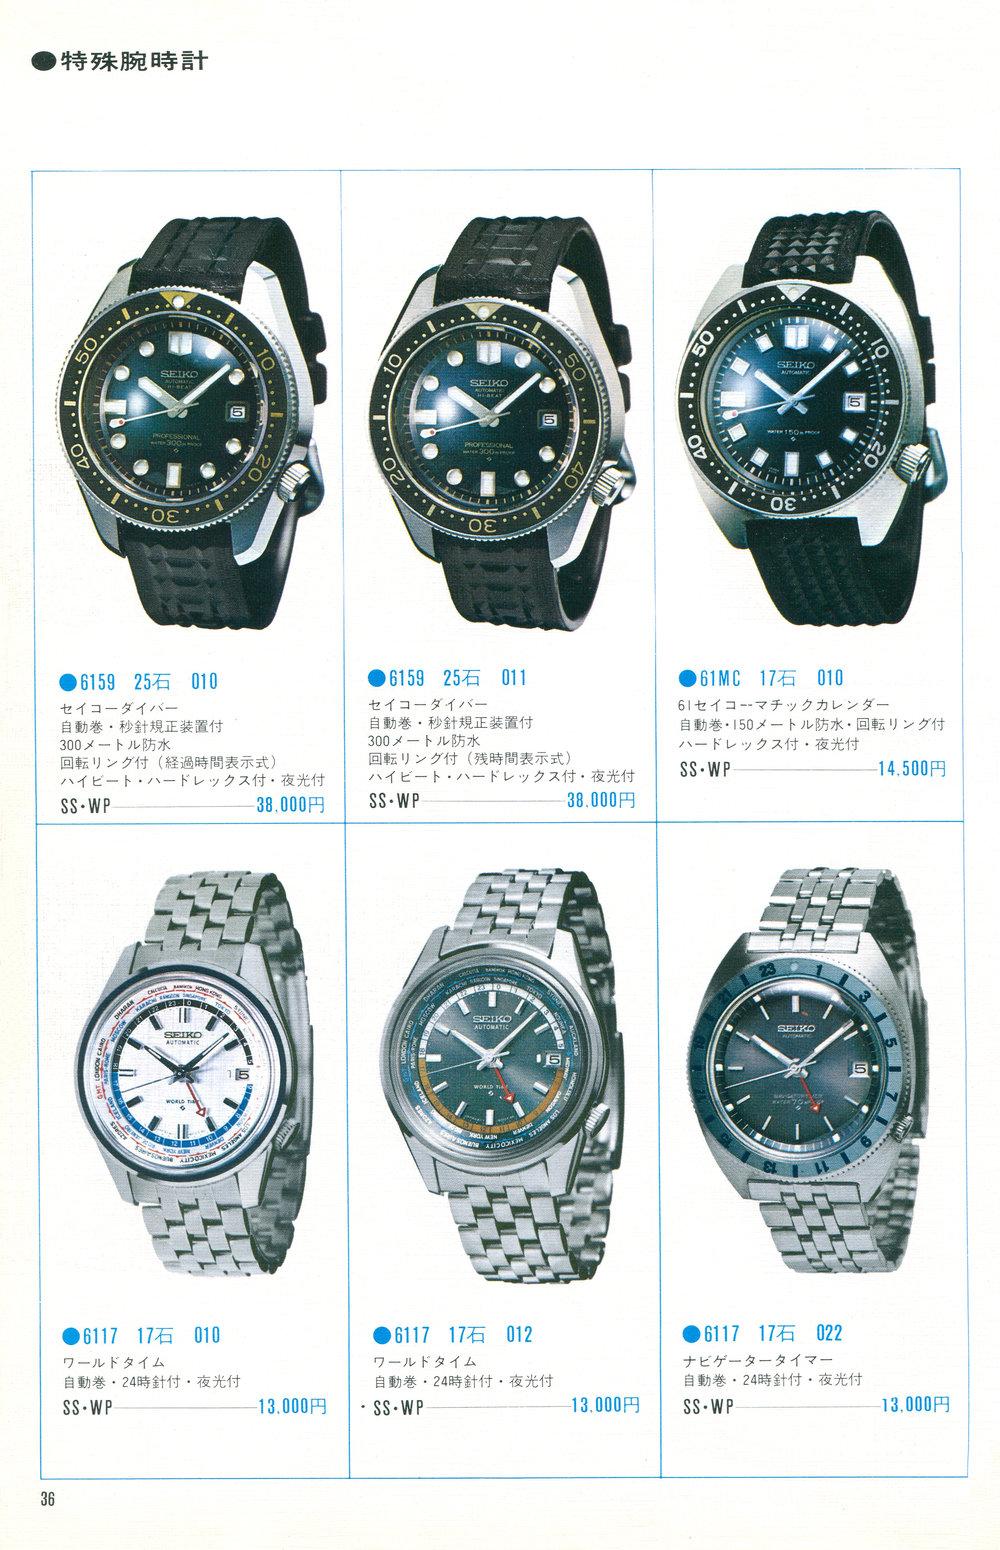 1969 Vol.2 Seiko JDM Catalog